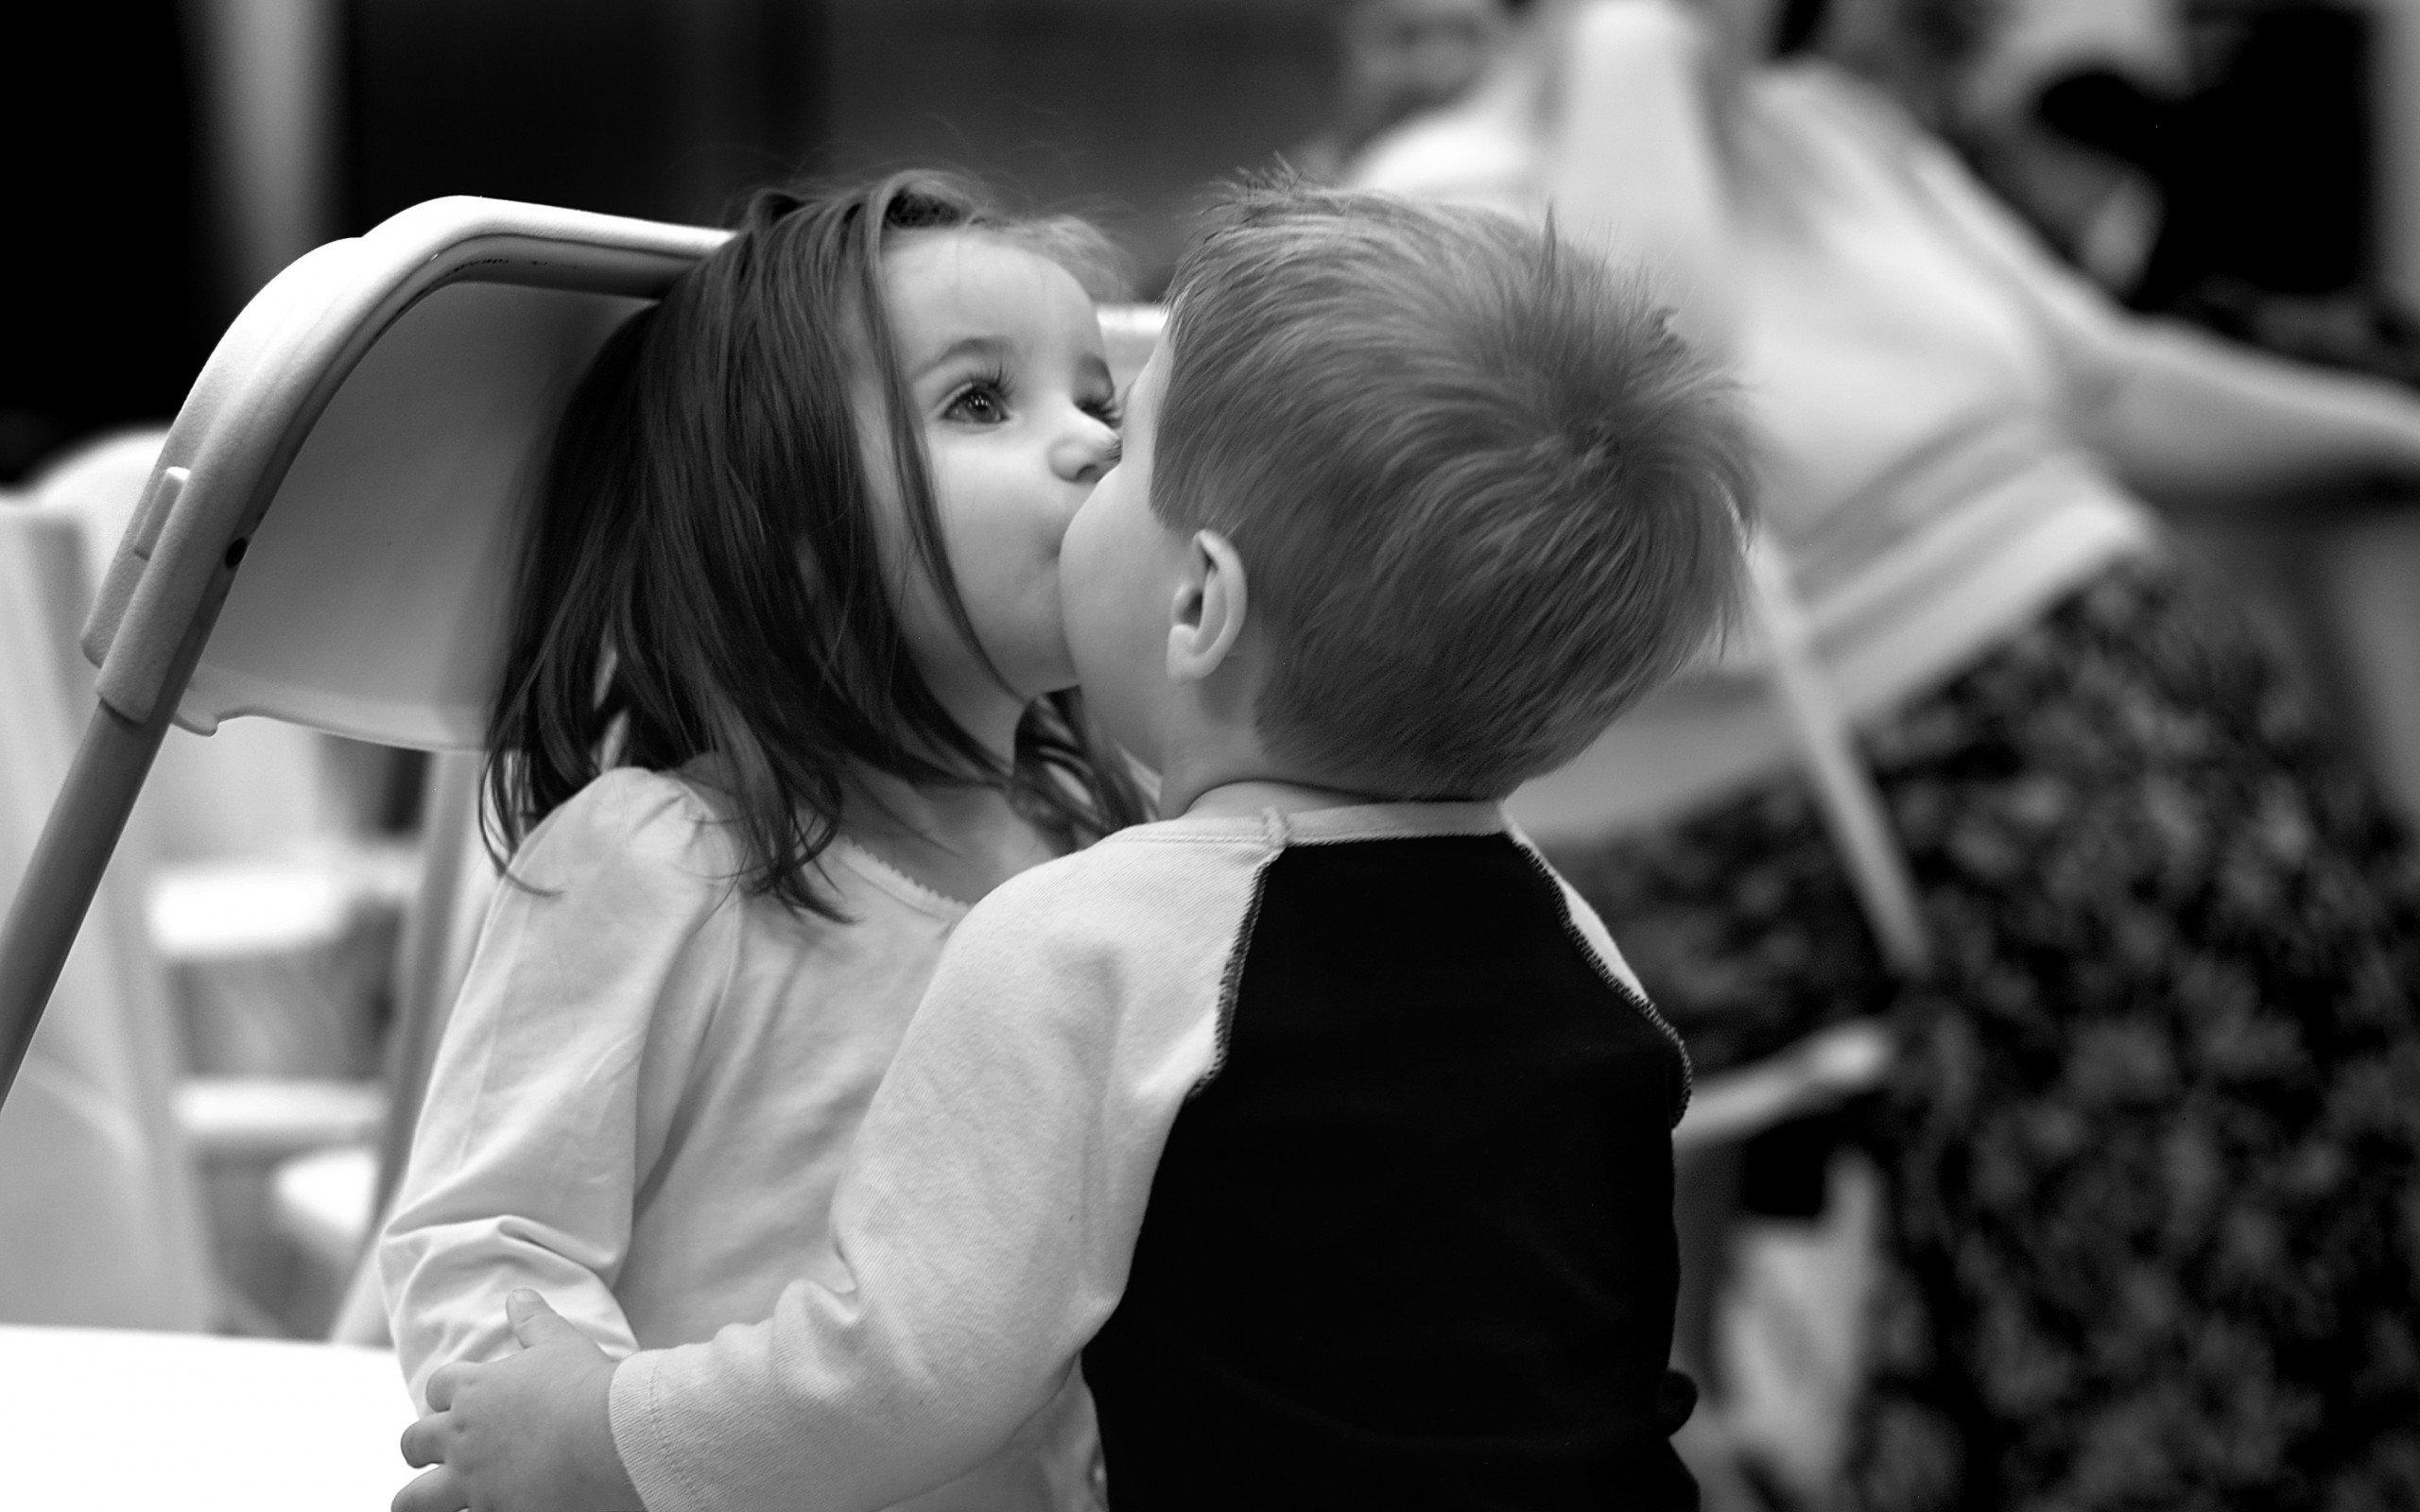 kissing kiss mood love sexy wallpaper   2560x1600   487037   wallpaperup